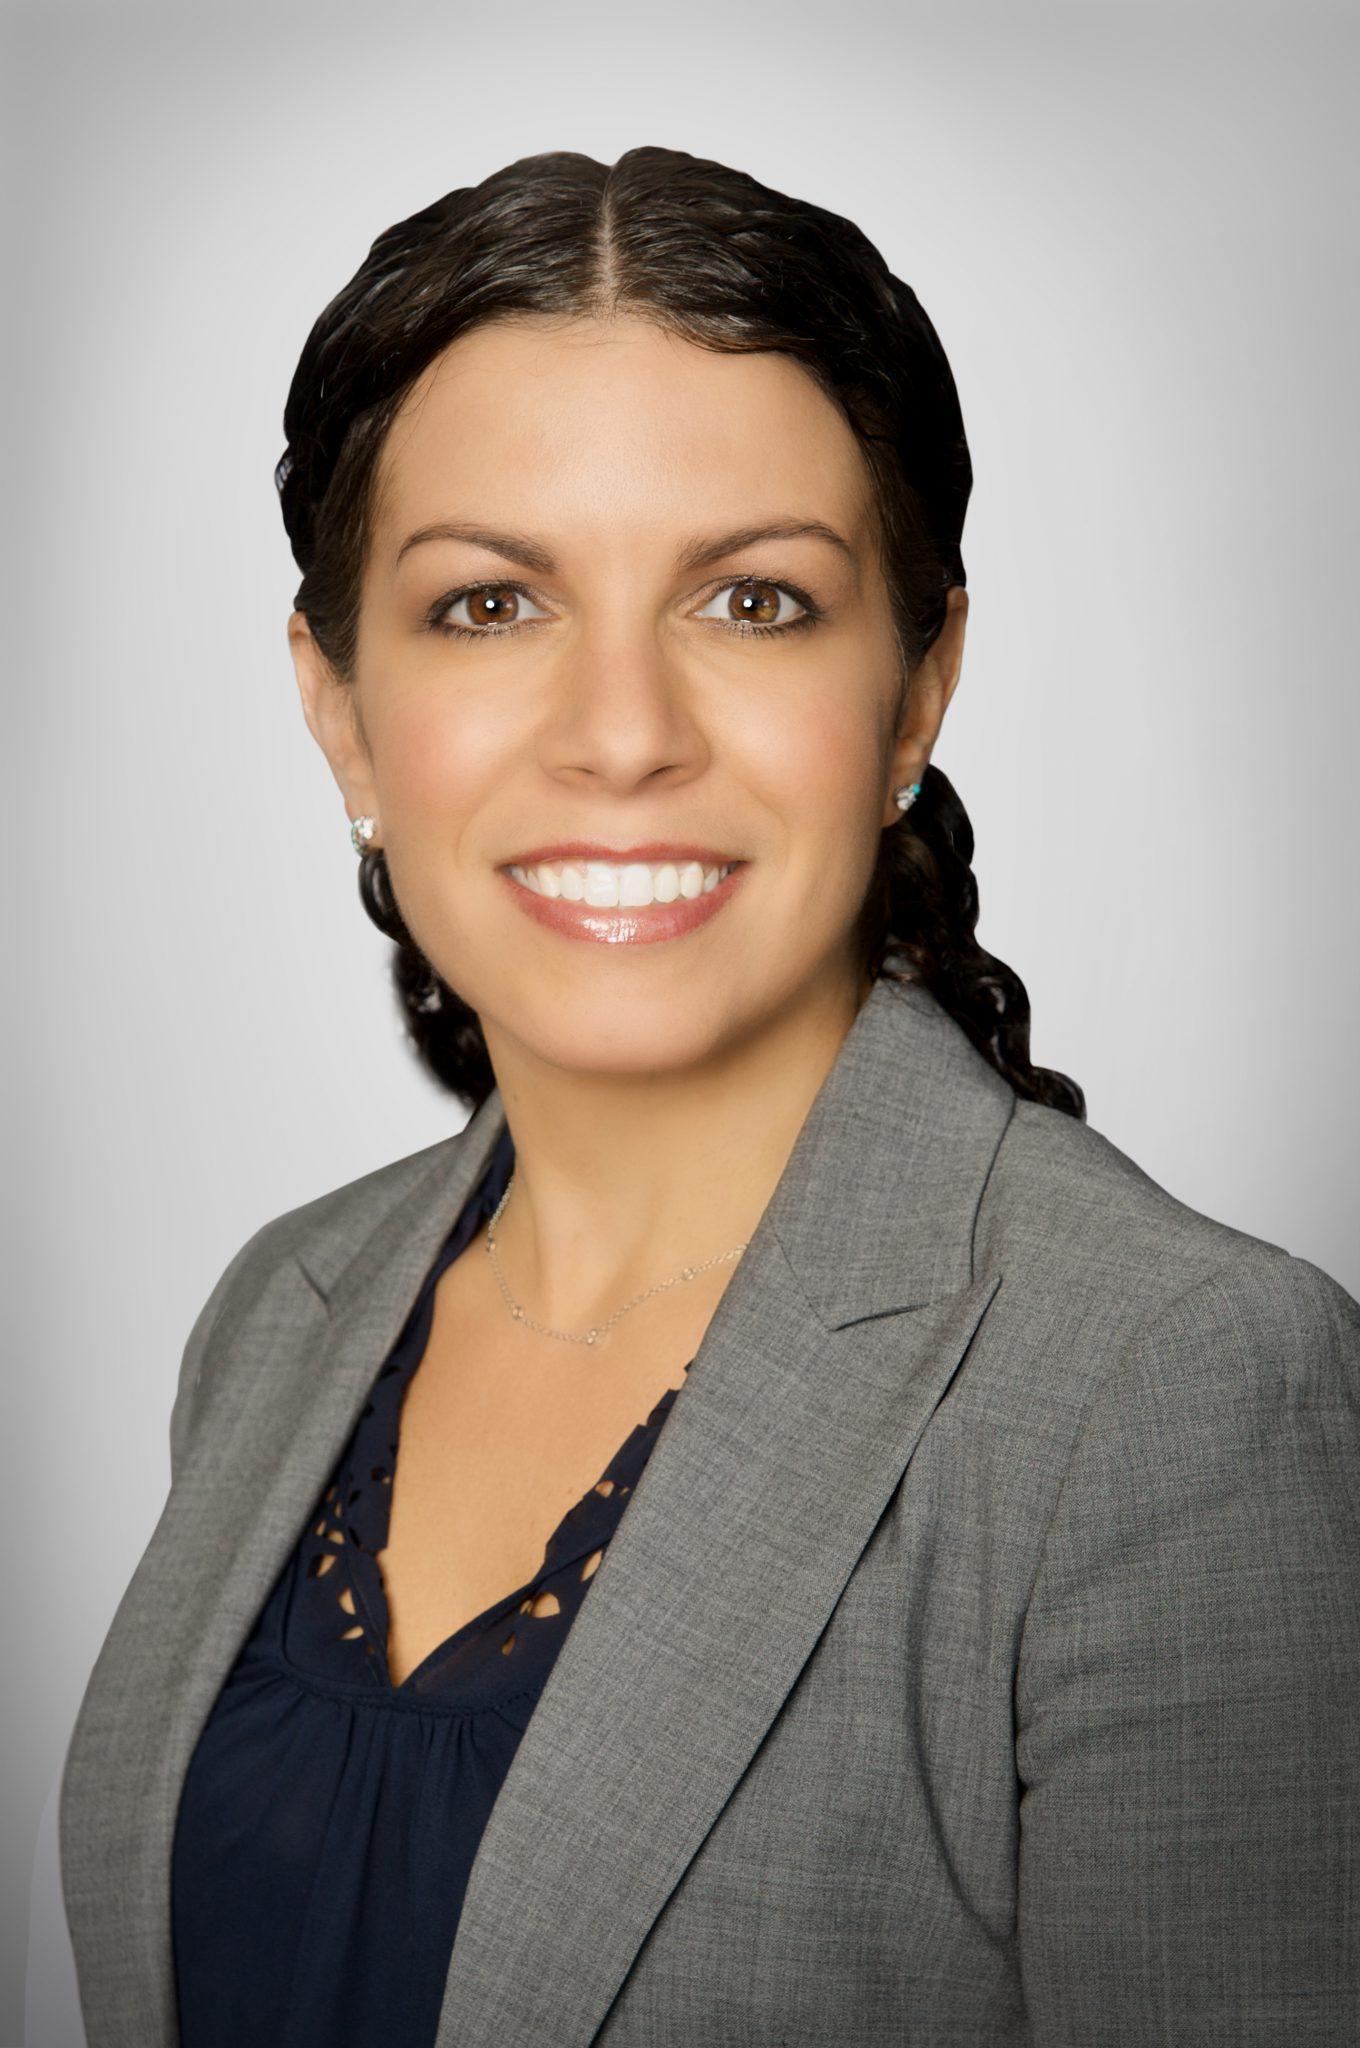 Pam Goldminz SandsPoint Capital Advisors